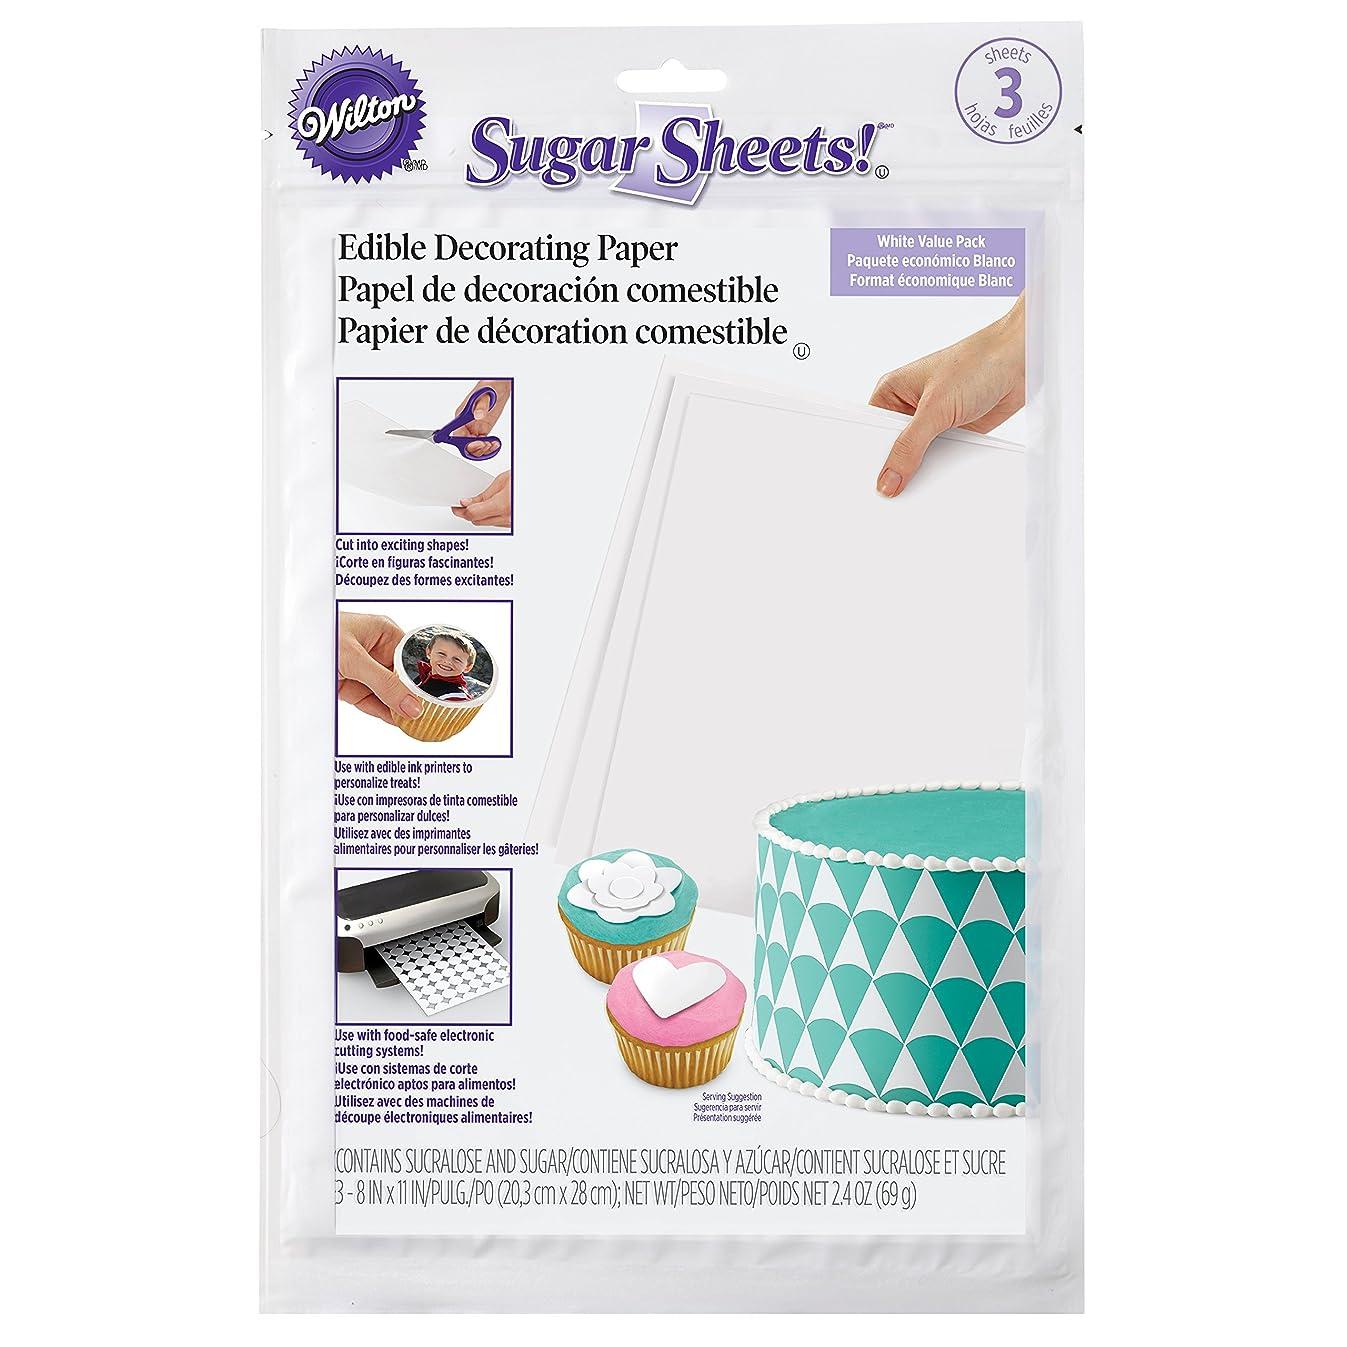 Wilton White Sugar Sheets Edible Decorating Paper, 3-Count